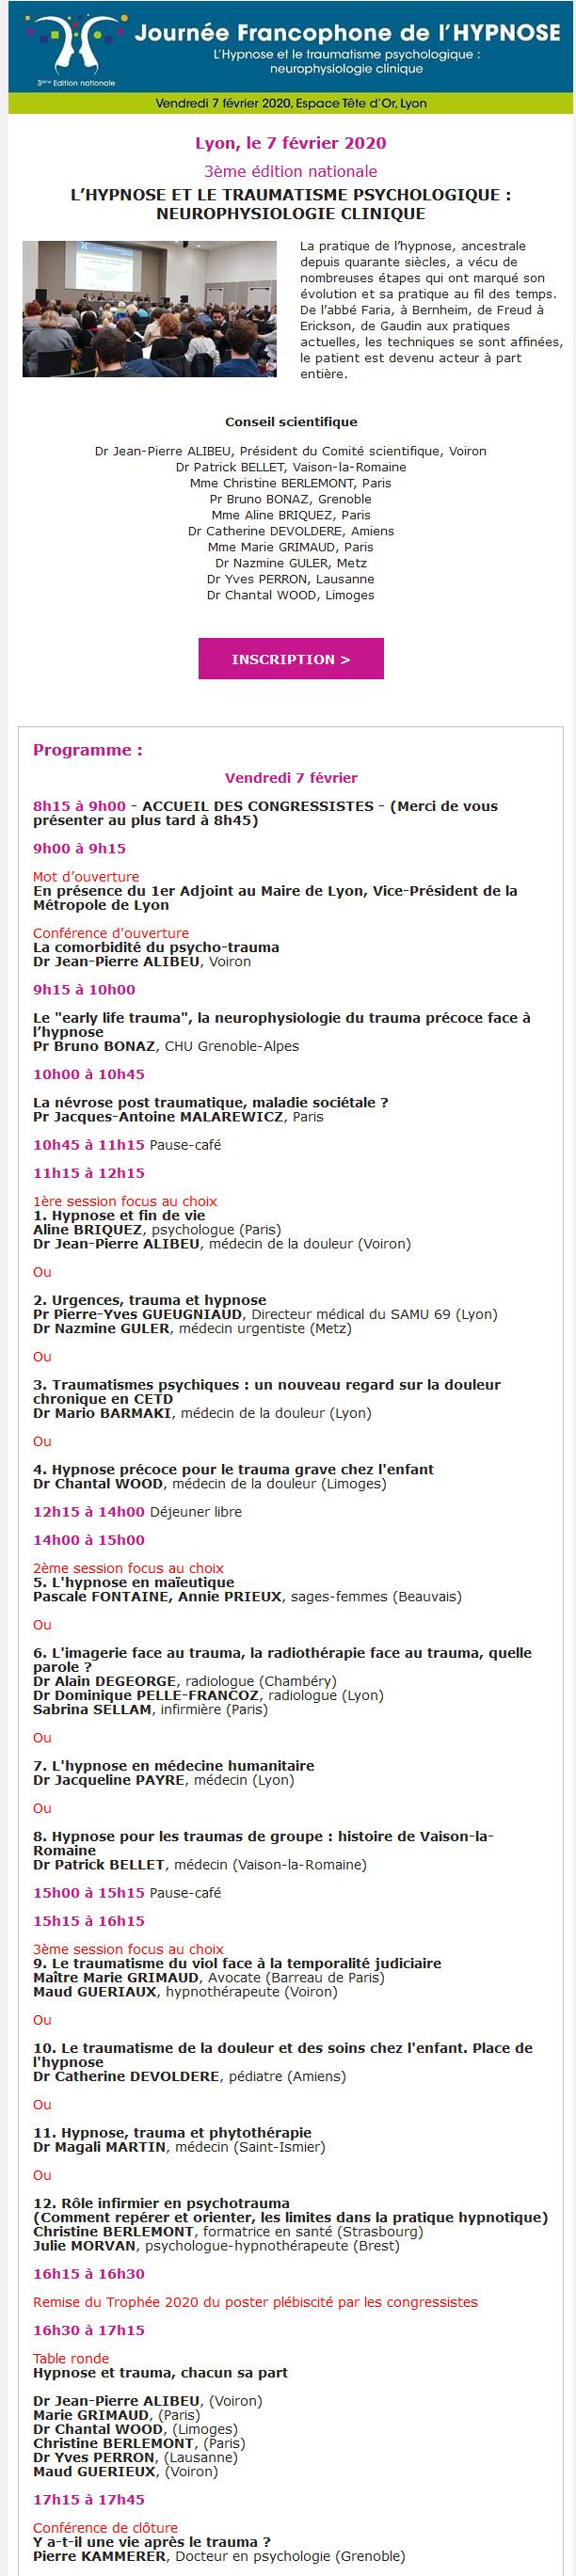 Screenshot_2020-01-15 Journée Francophone de l'Hypnose.png